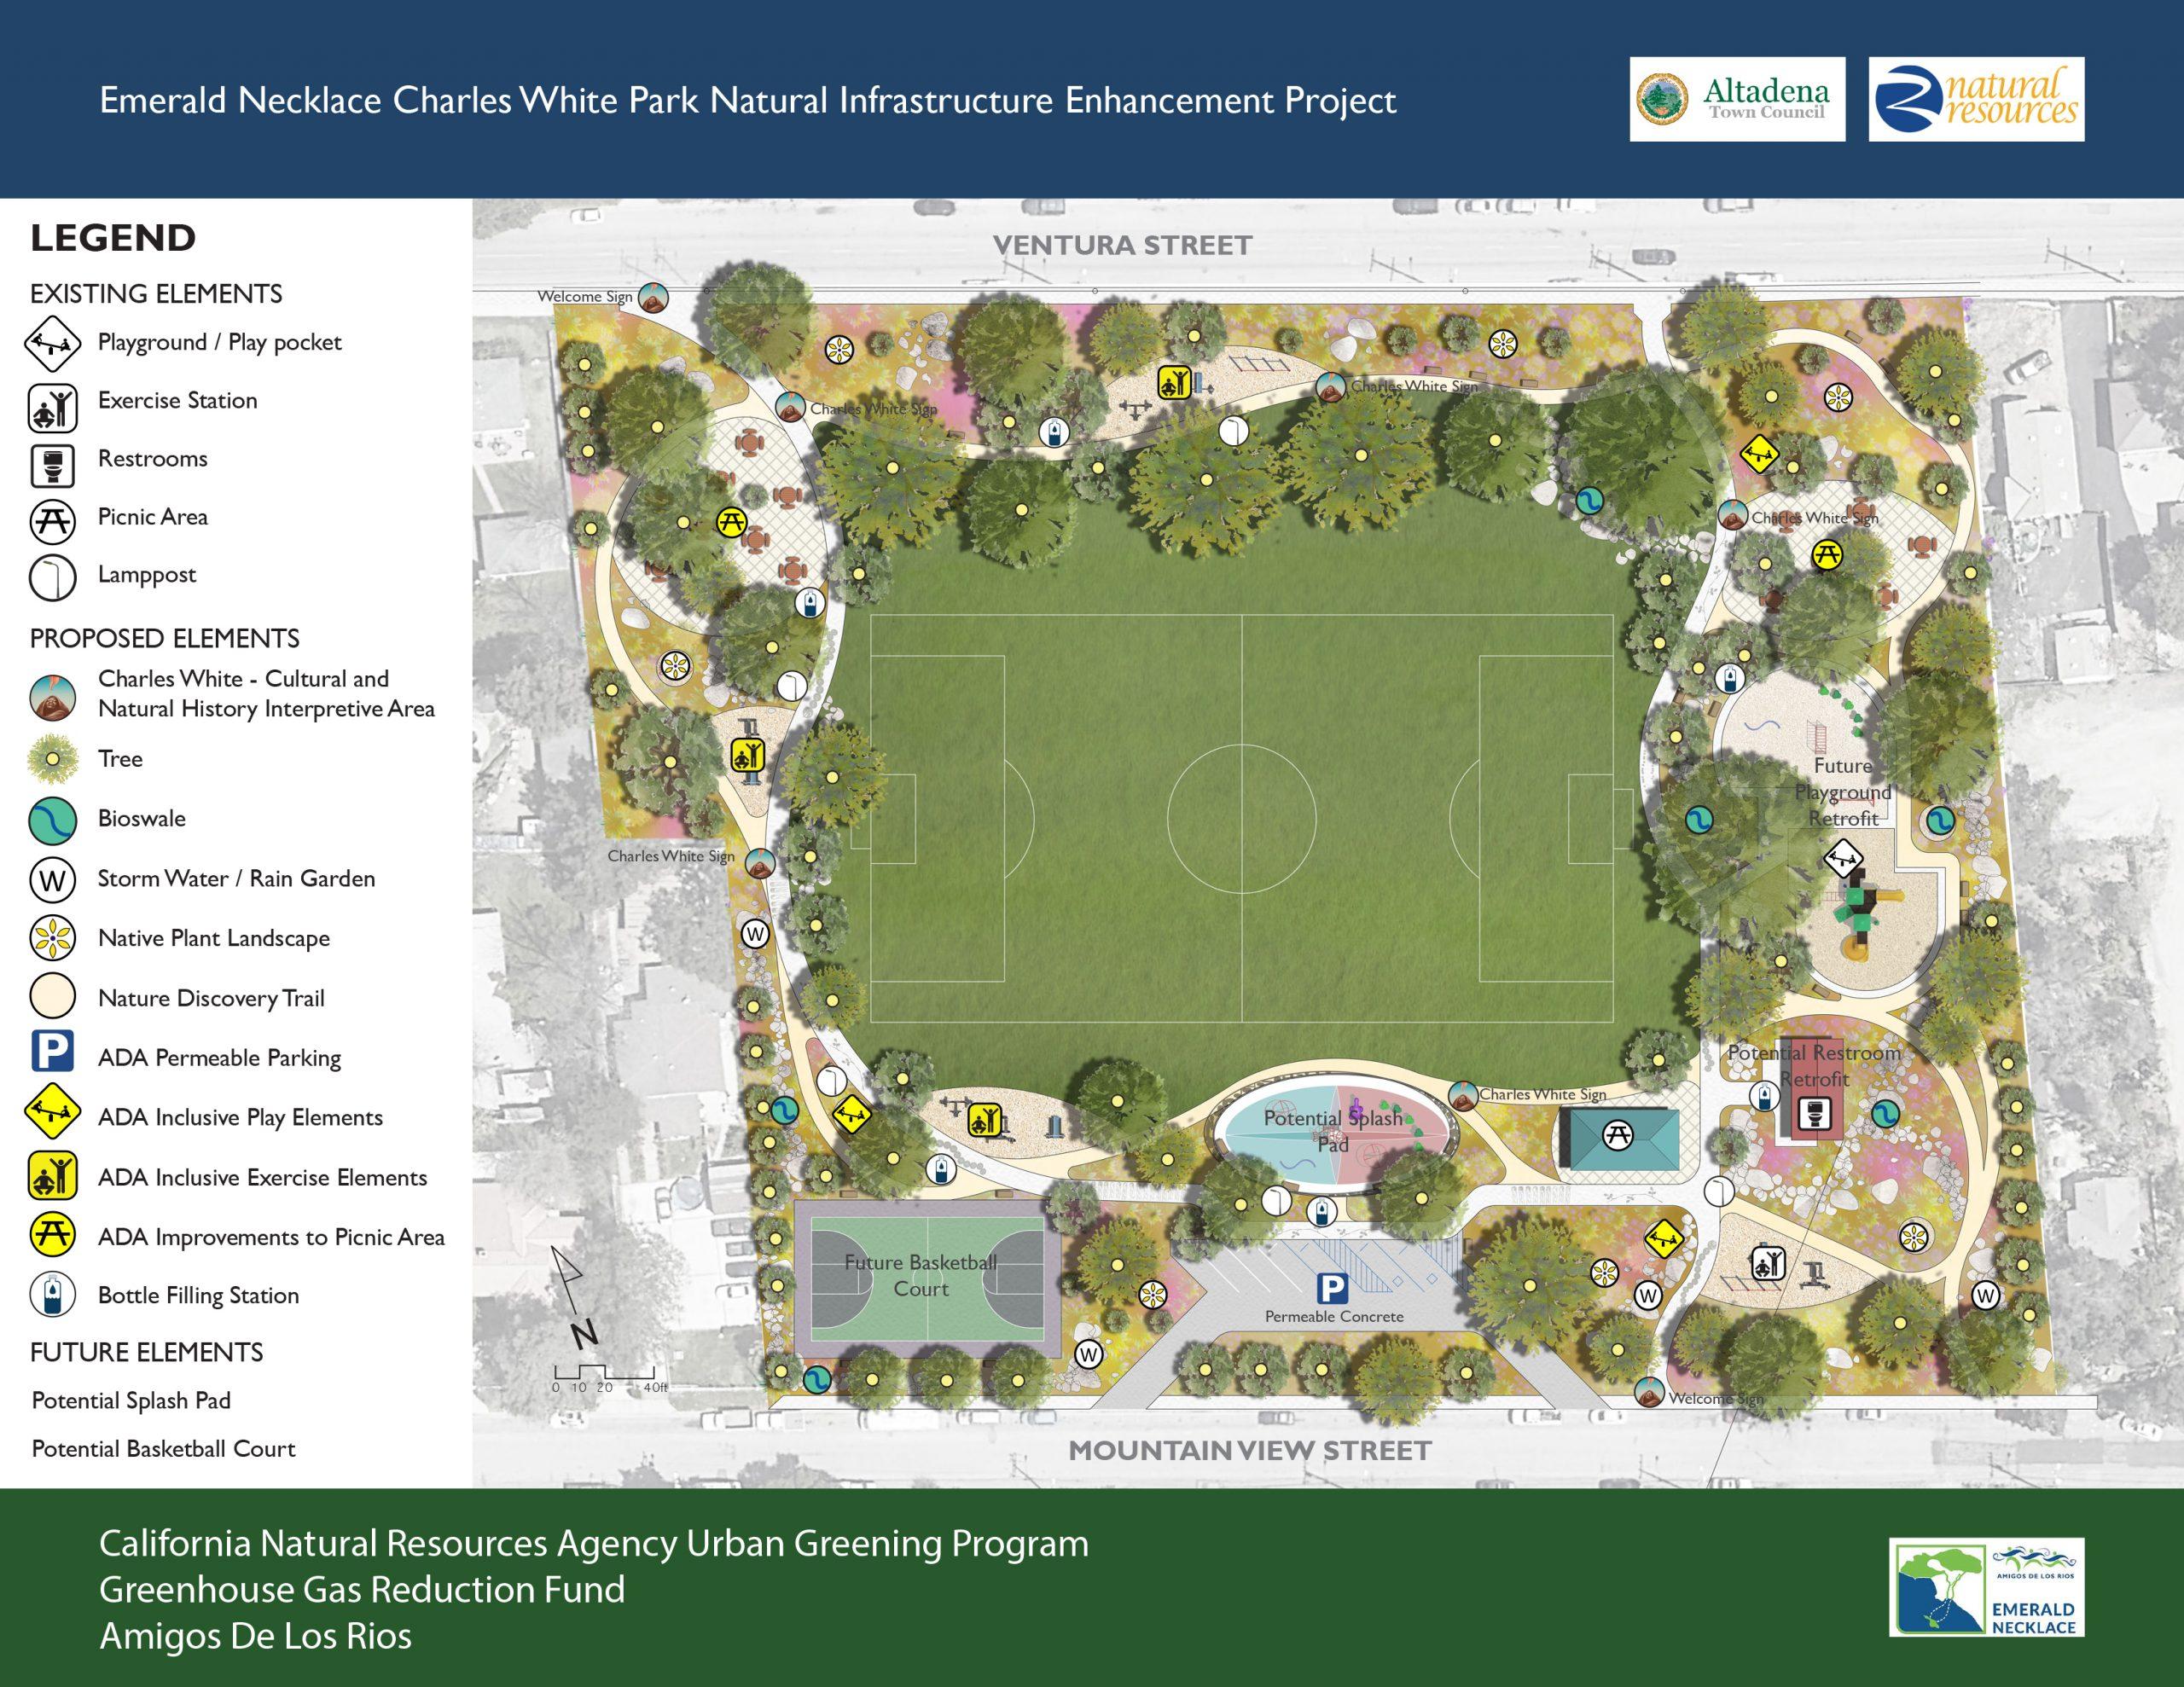 Charles White Park Enhancements